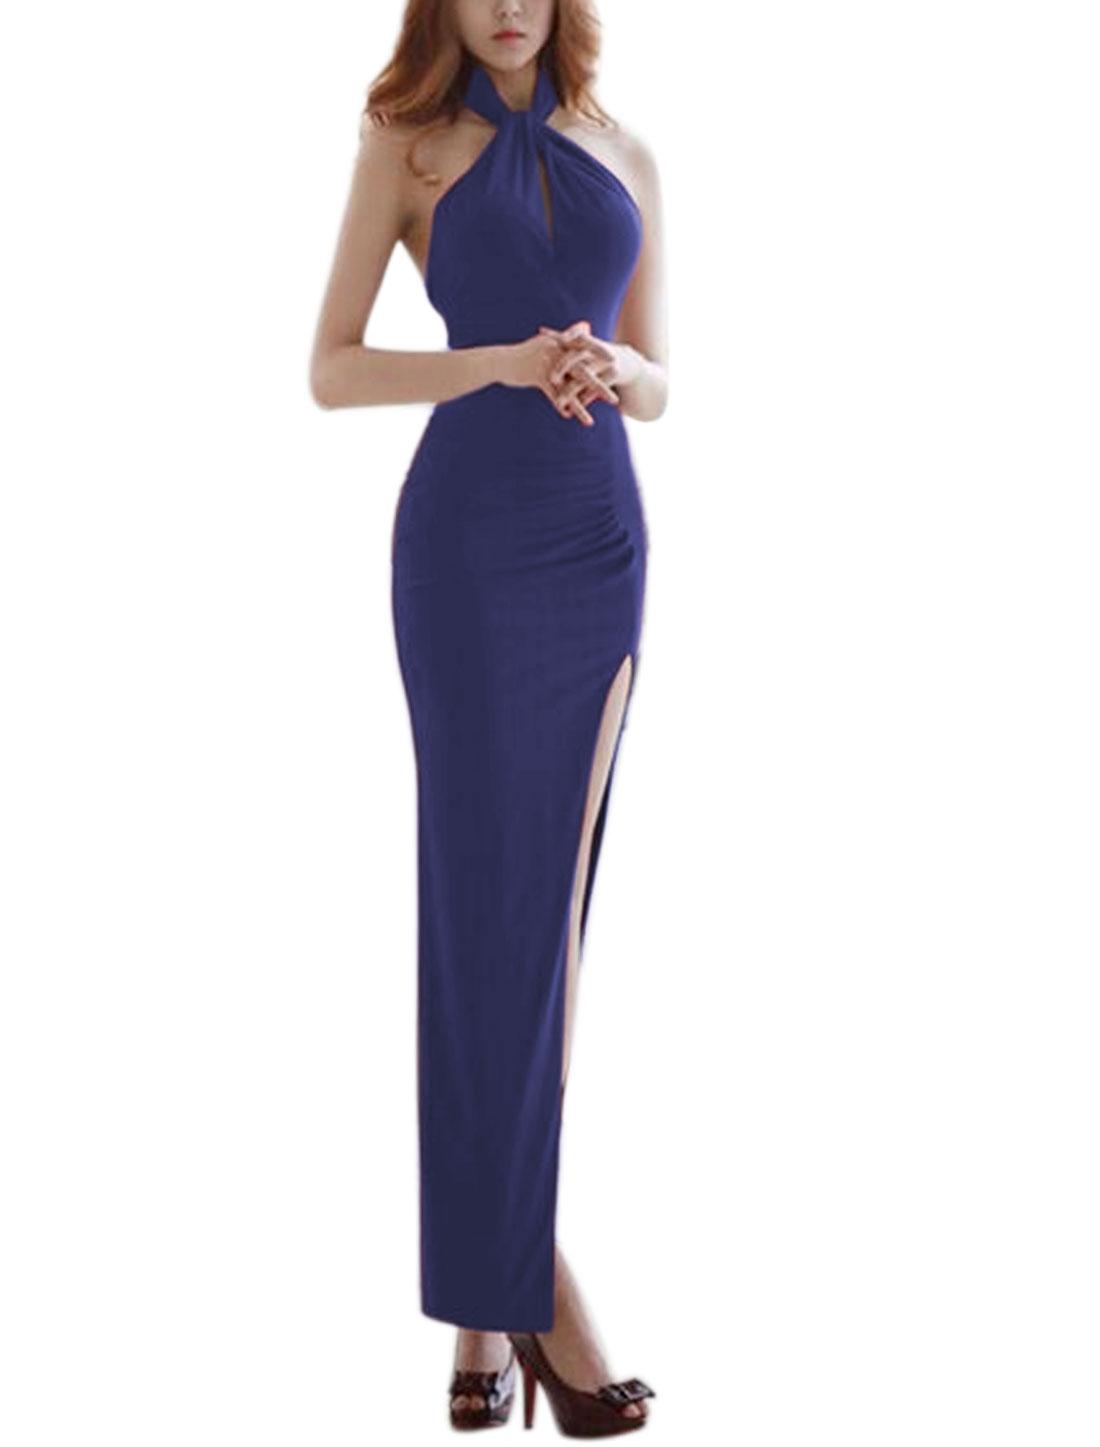 Women Backless High Split Halter Neck Slim Fit Maxi Dress Blue S